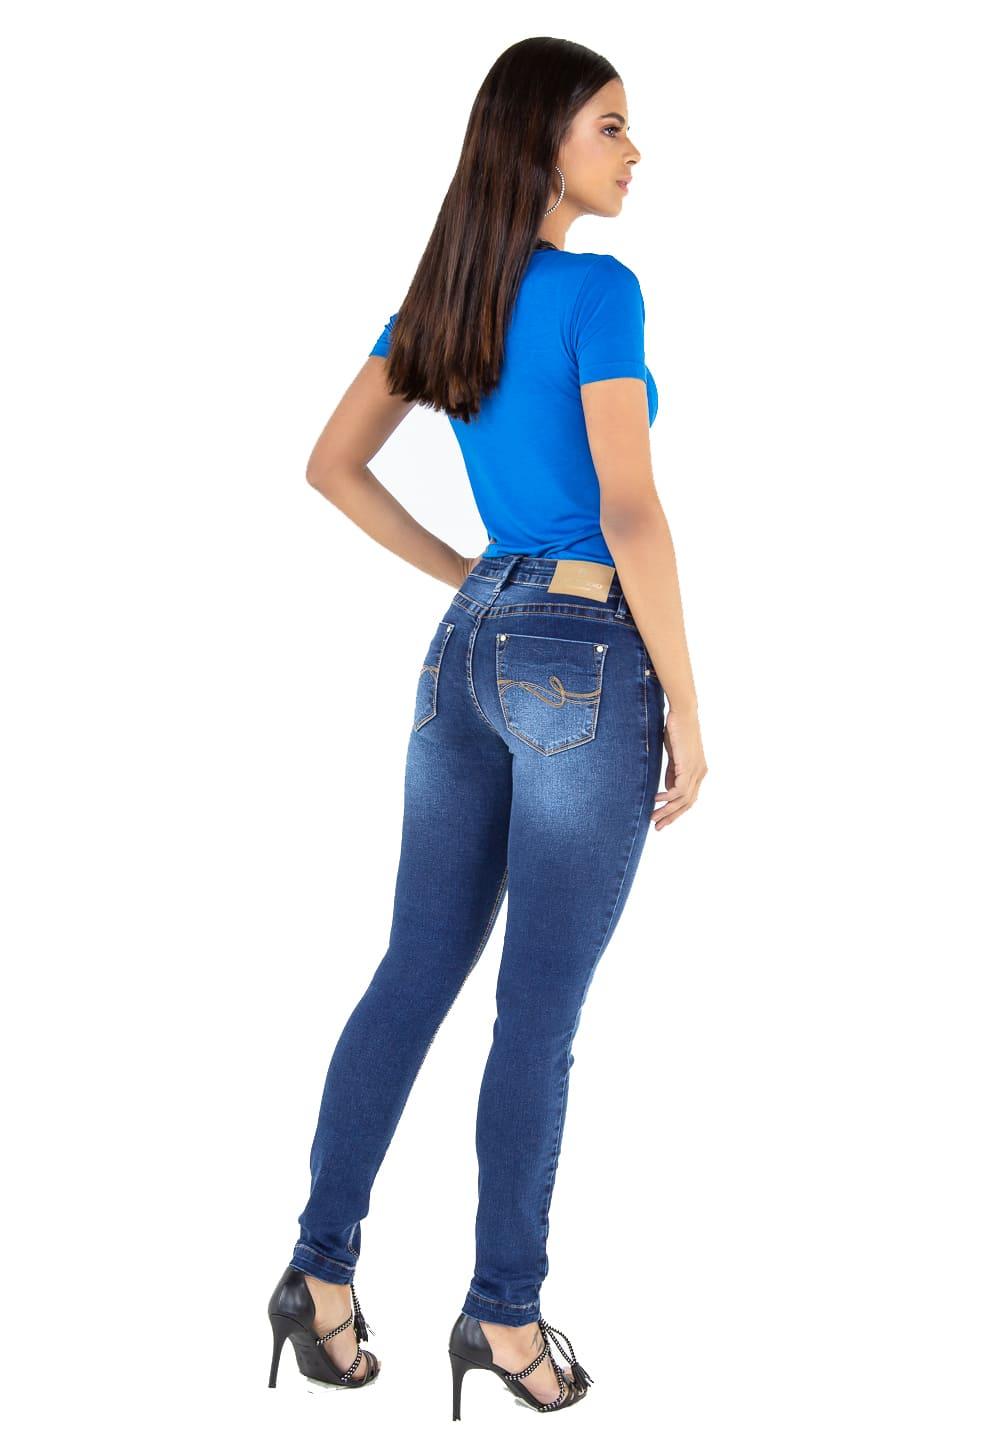 Calça Skinny Feminina Tradicional Jeans